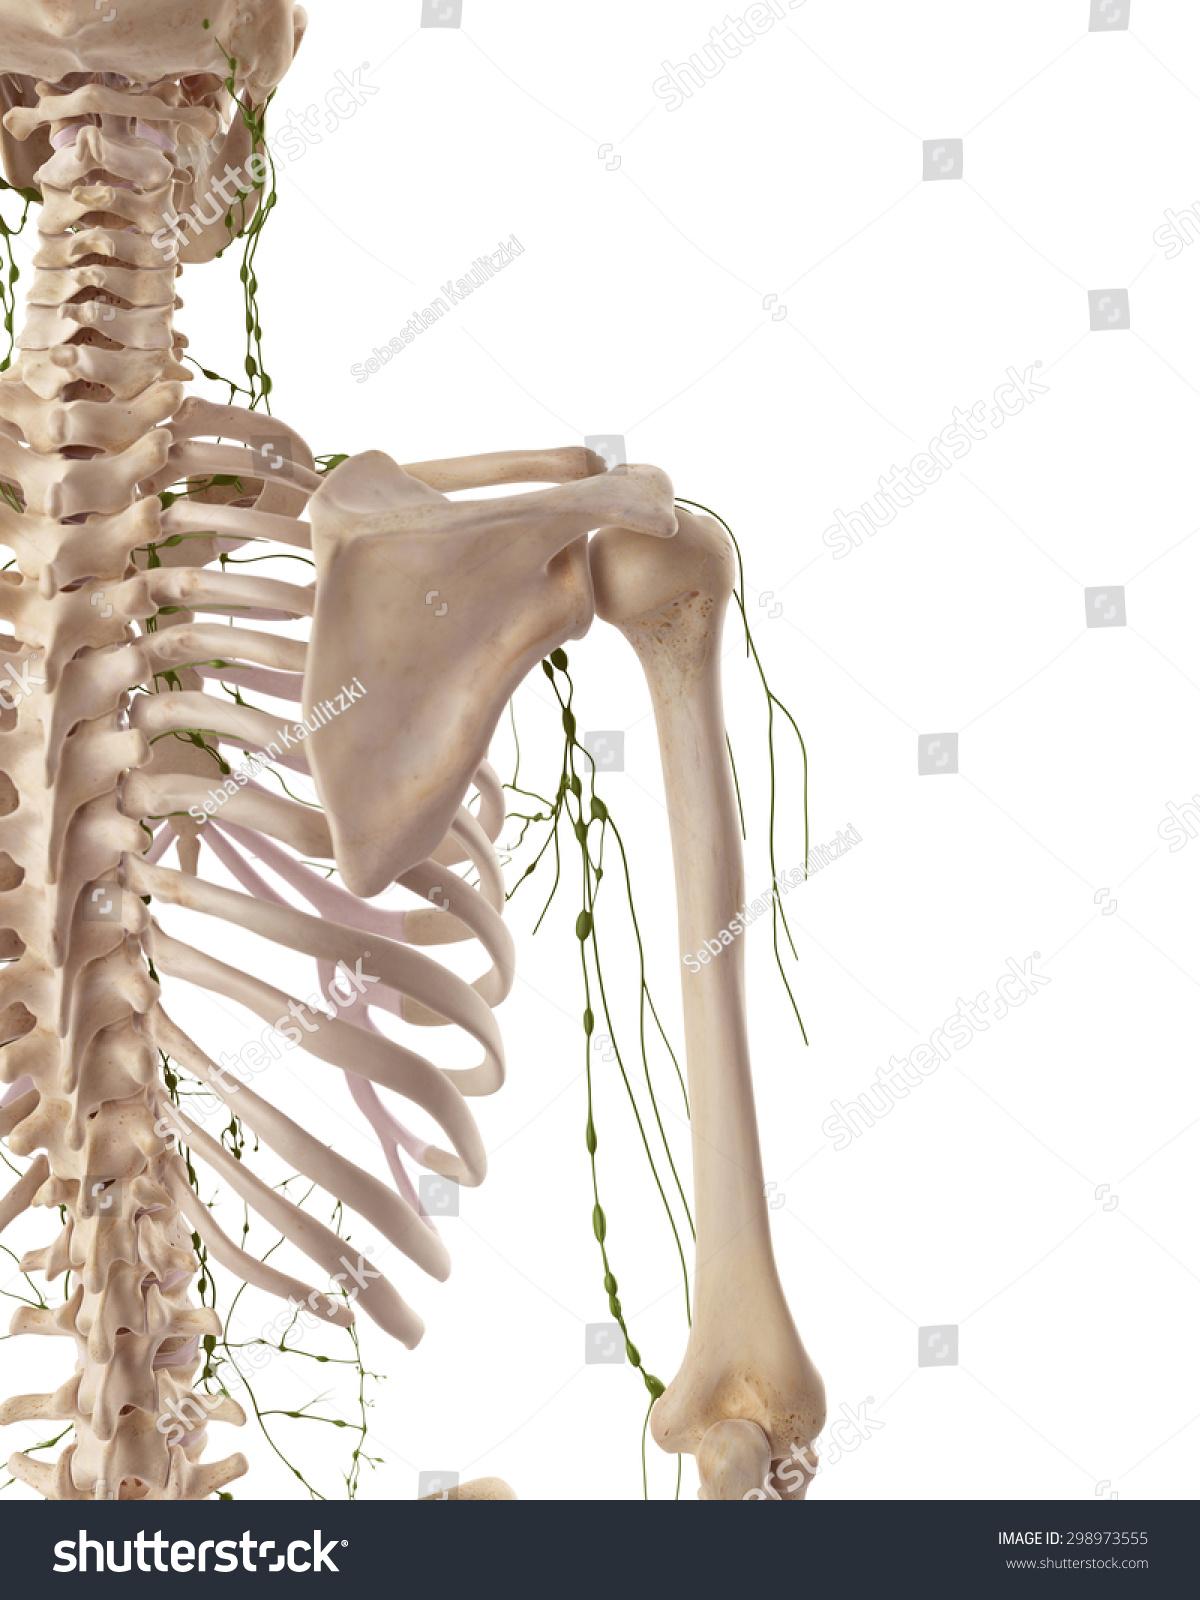 Axillary node dissection anatomy